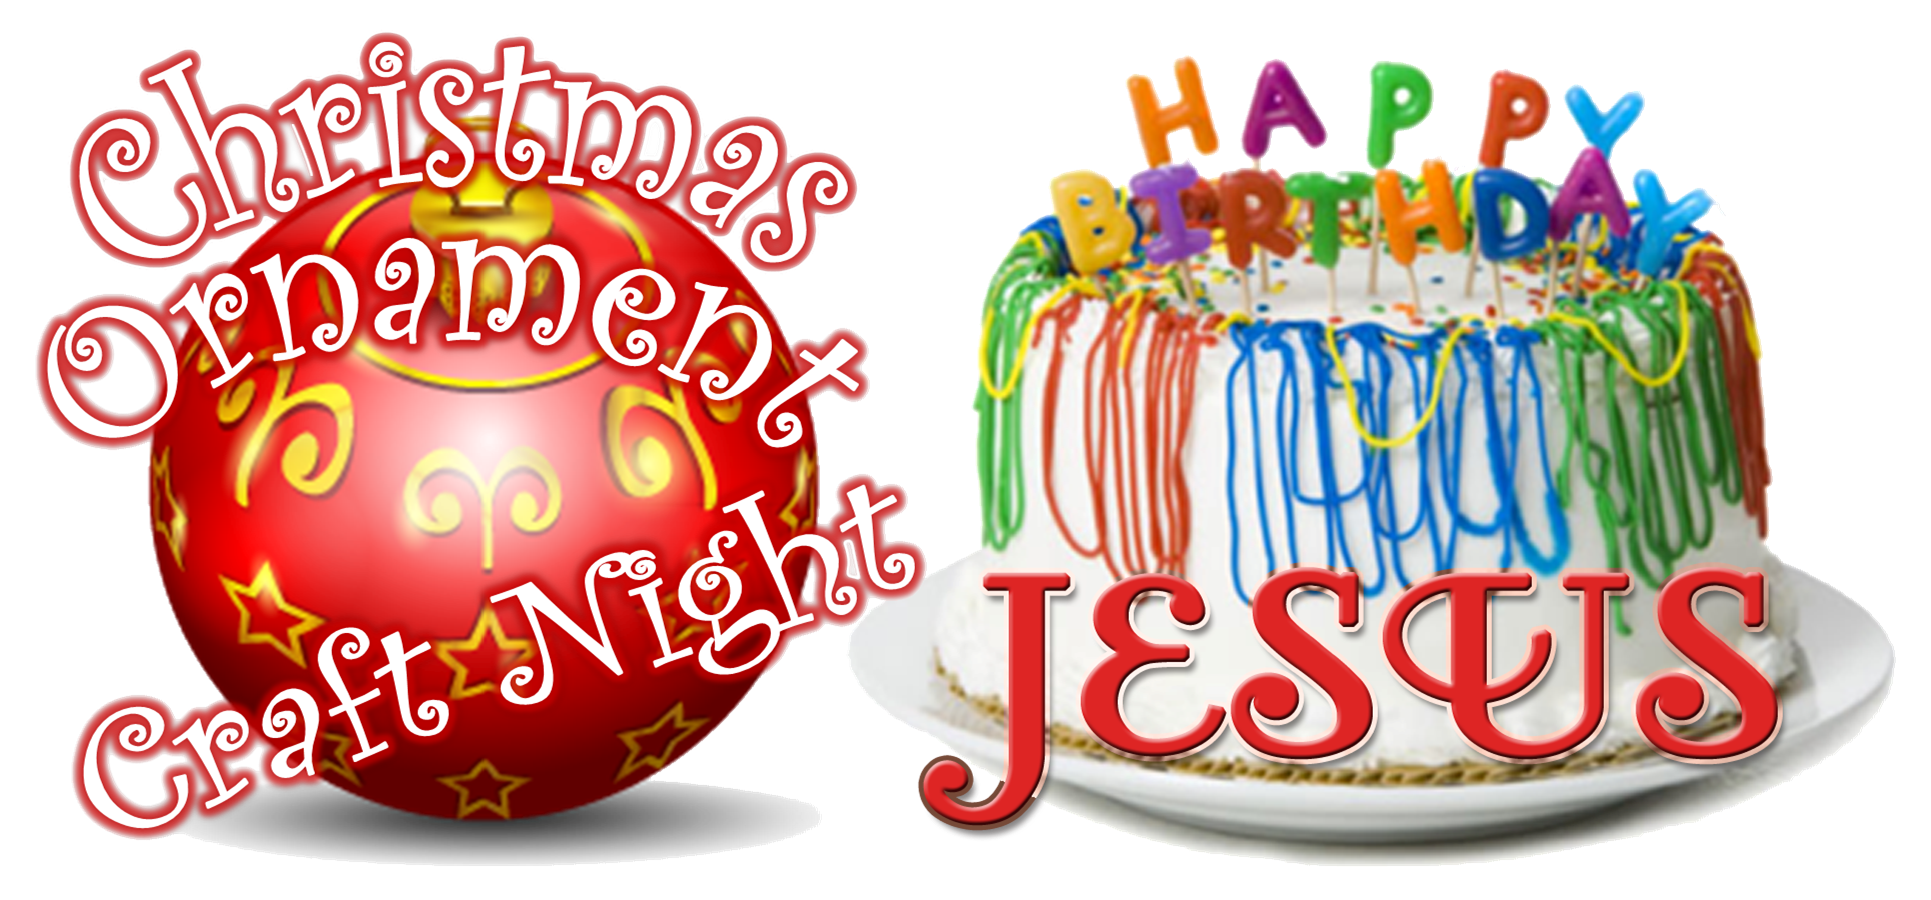 transparent download Happy birthday jesus clipart. Awana christmas ornament night